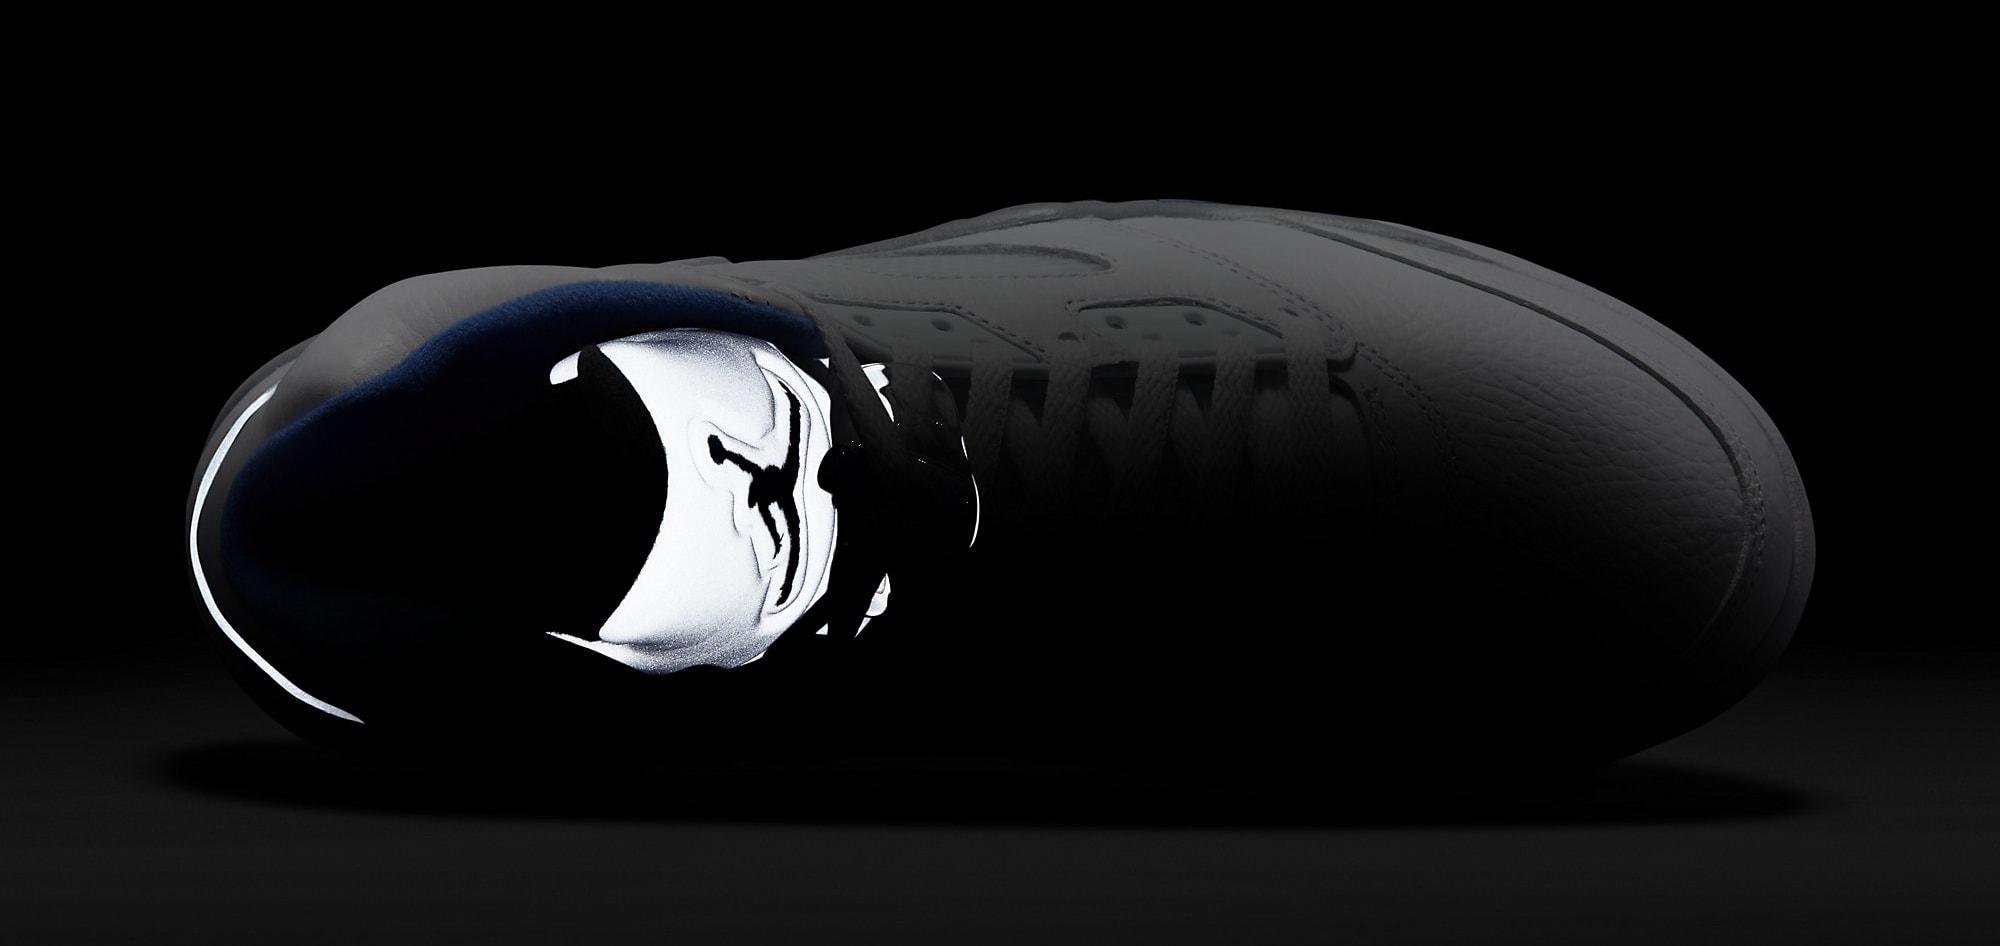 Air Jordan 5 Retro 'Hyper Royal' DD0587-140 3M